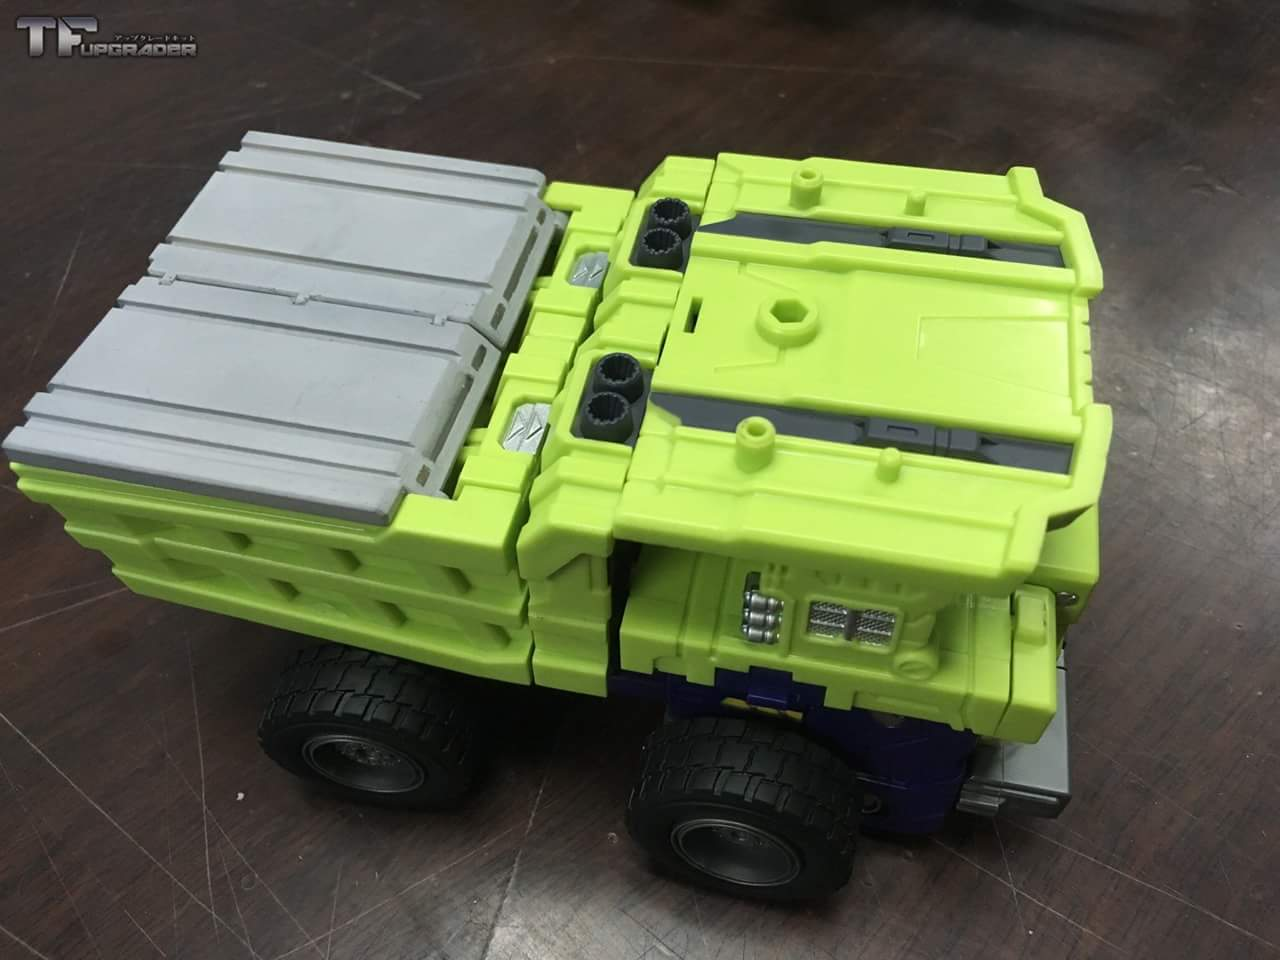 [Toyworld] Produit Tiers - Jouet TW-C Constructor aka Devastator/Dévastateur (Version vert G1 et jaune G2) - Page 8 Z6WbkxjR